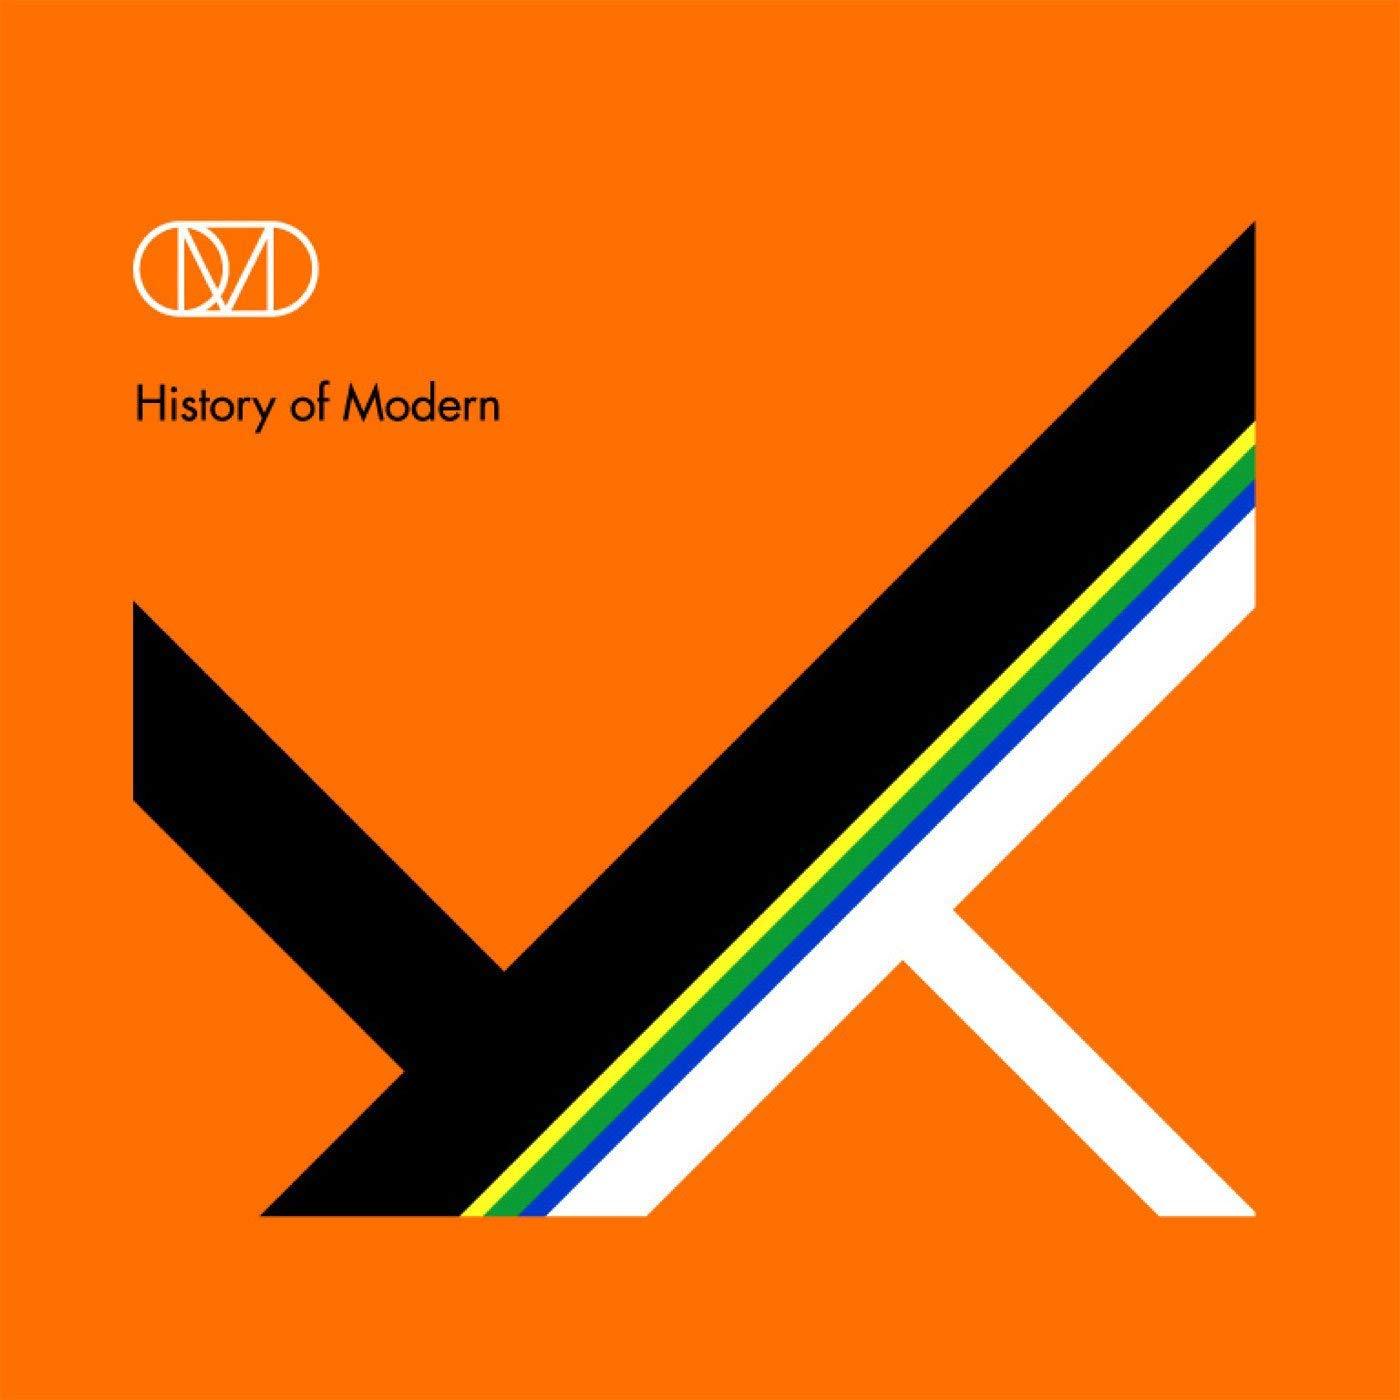 Vinilo : Omd - History Of Modern (United Kingdom - Import)